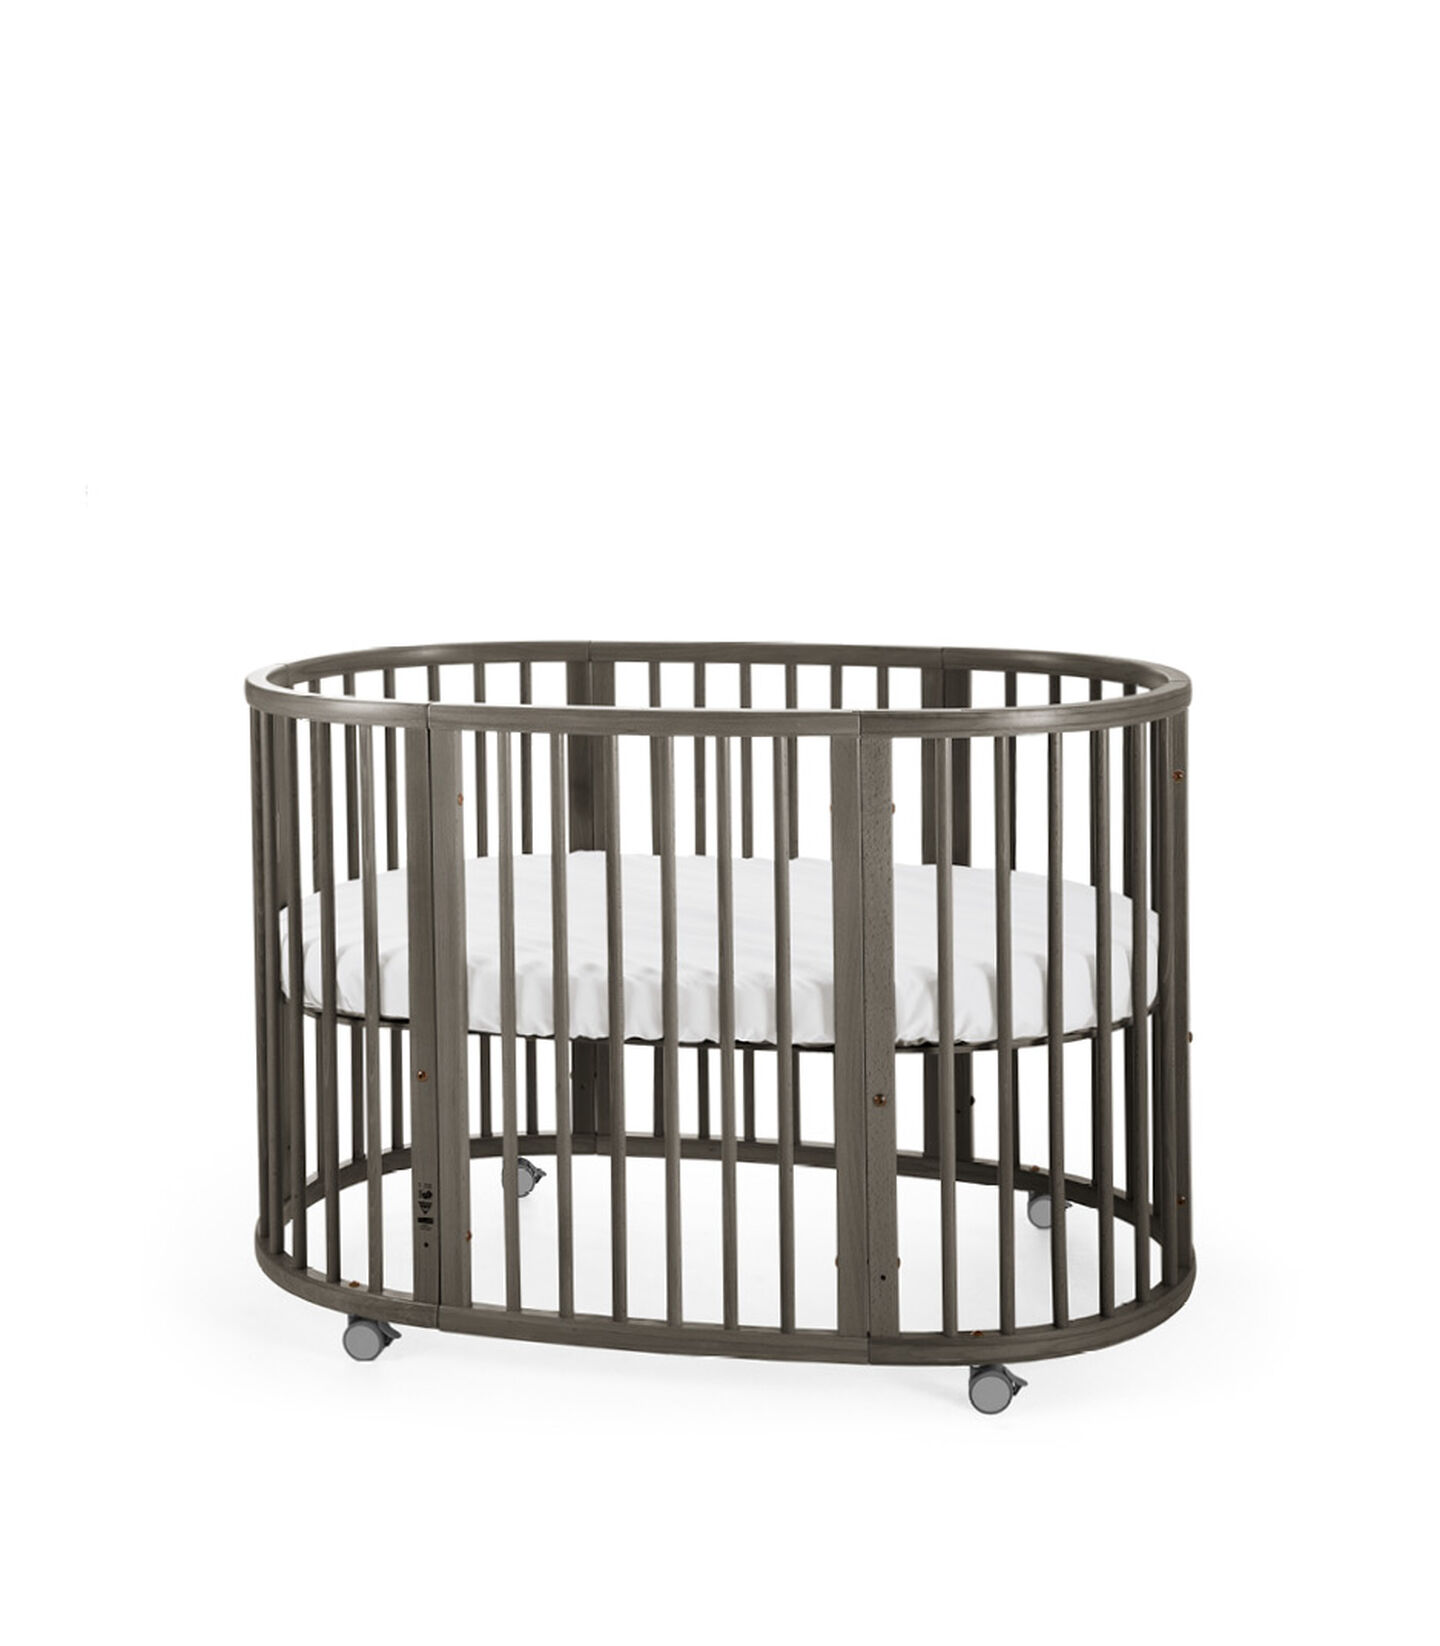 Stokke® Sleepi™ Bed Hazy Grey, Hazy Grey, mainview view 2